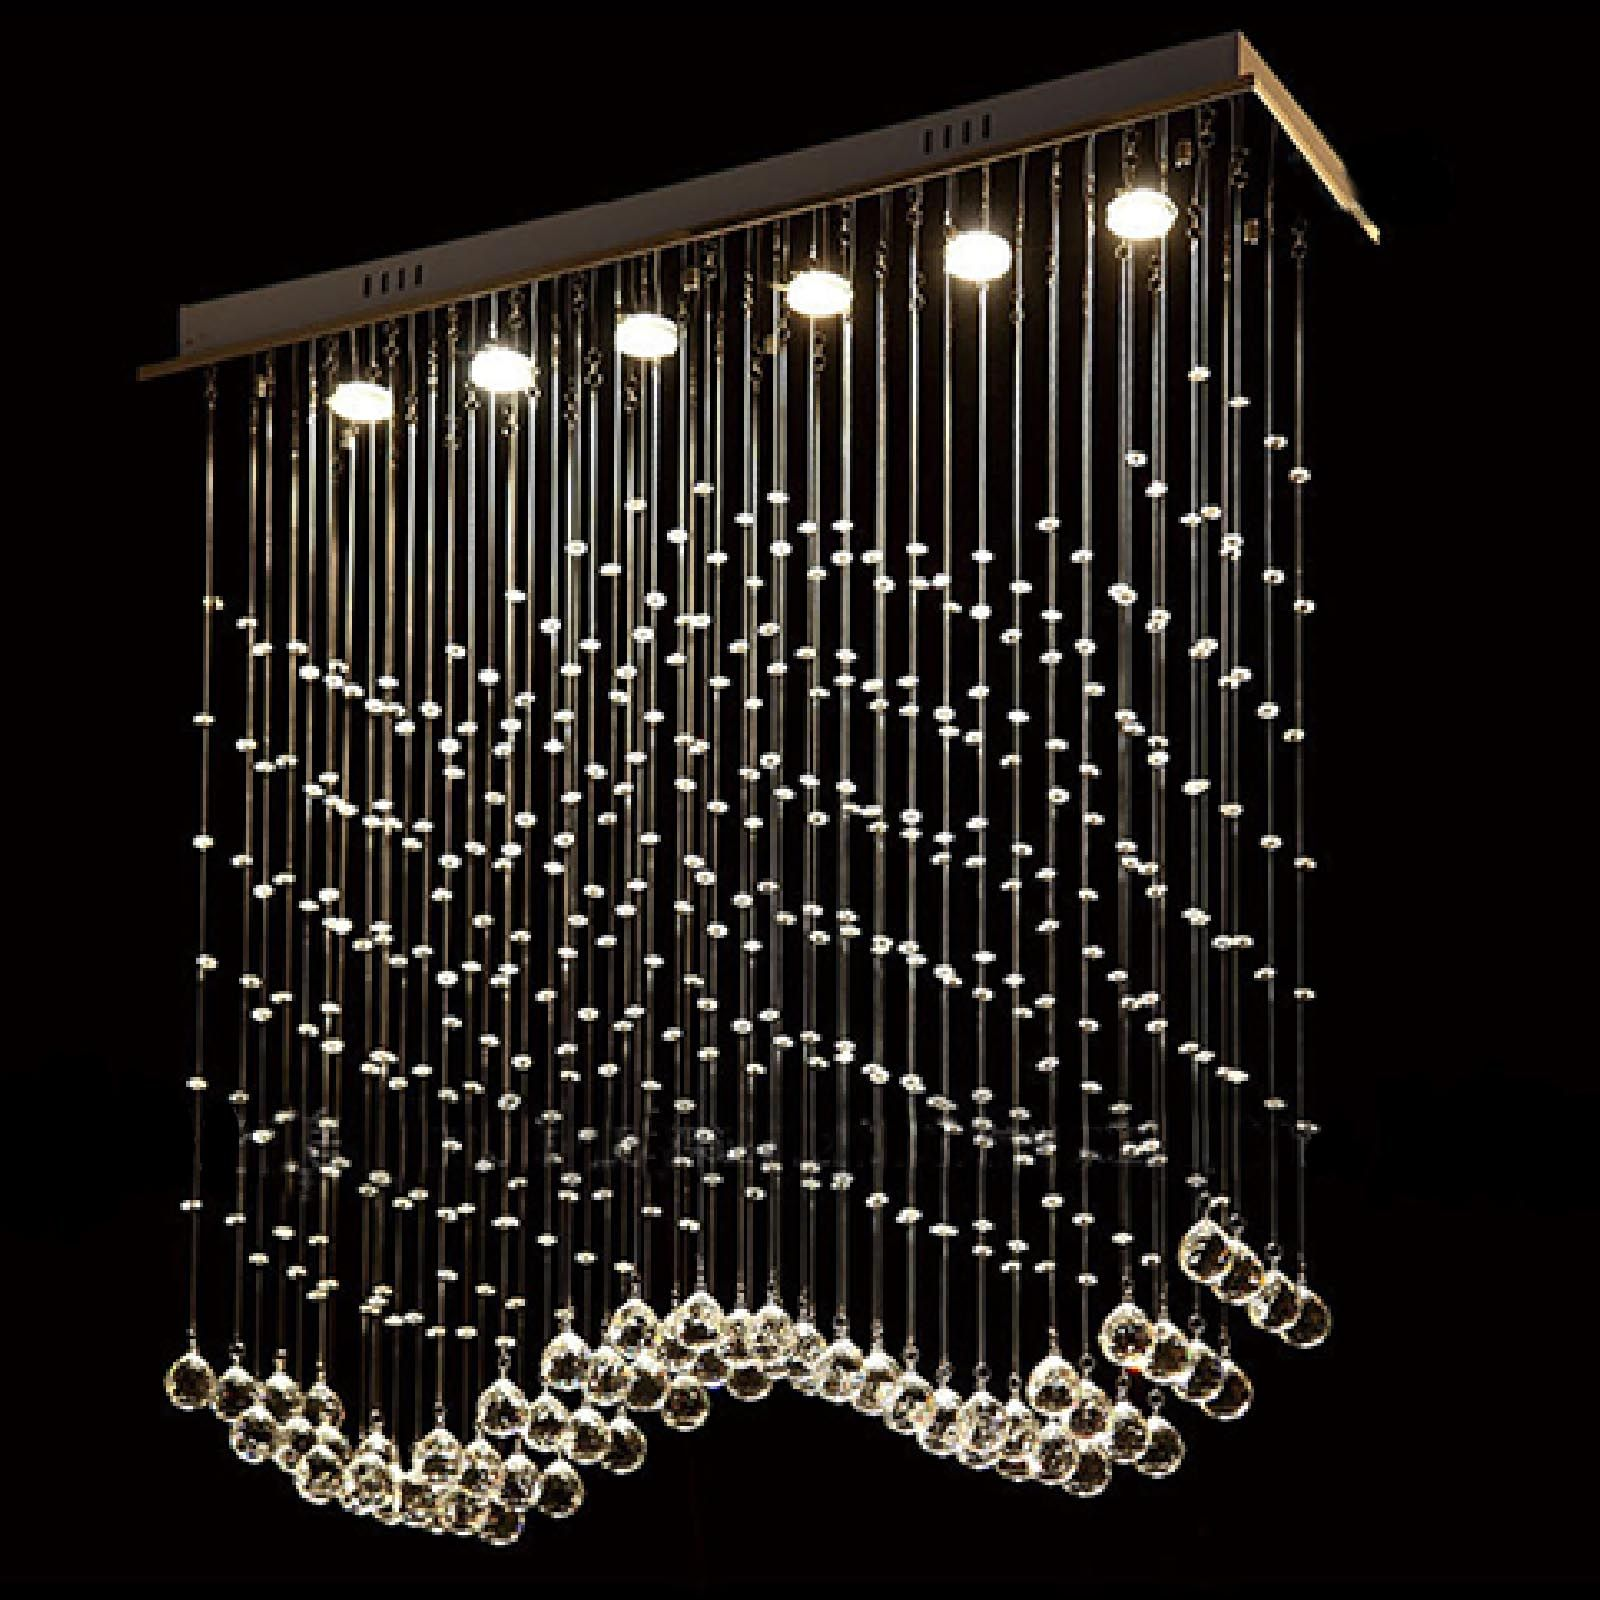 Byb New Wave Raindrop Crystal Chandelier Rain Drop Design Led Lighting H100 W25